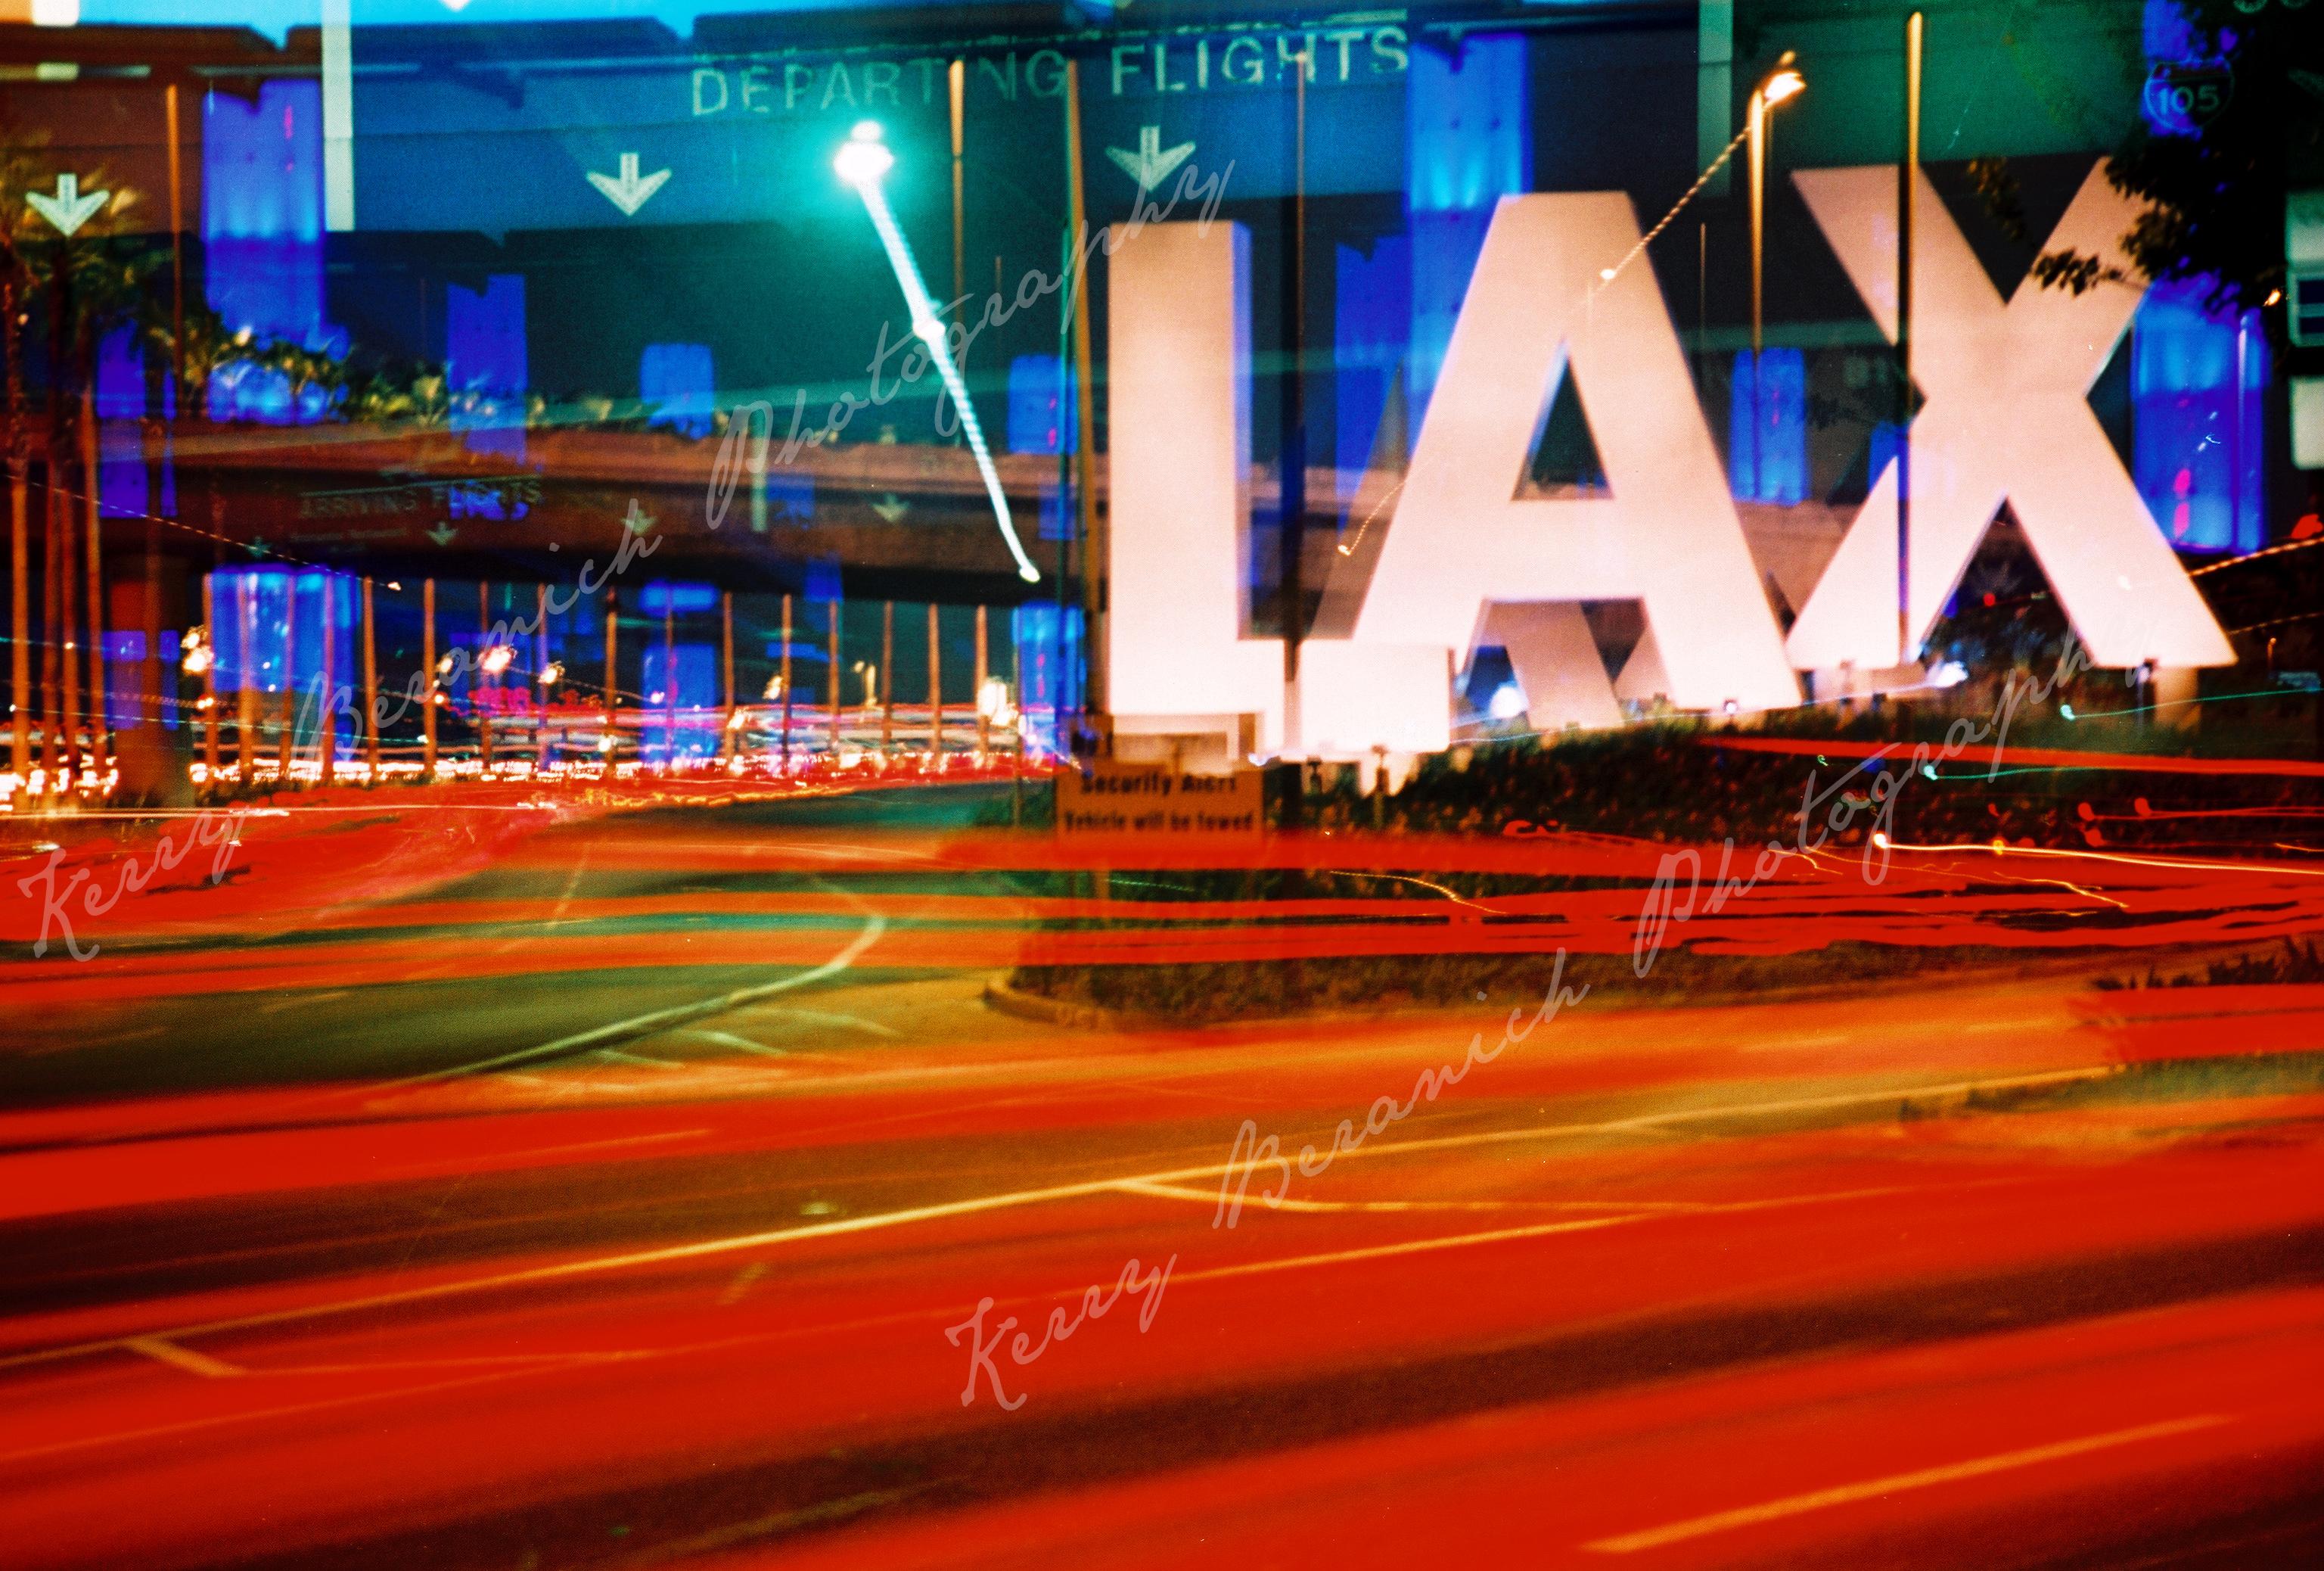 LAX watermark